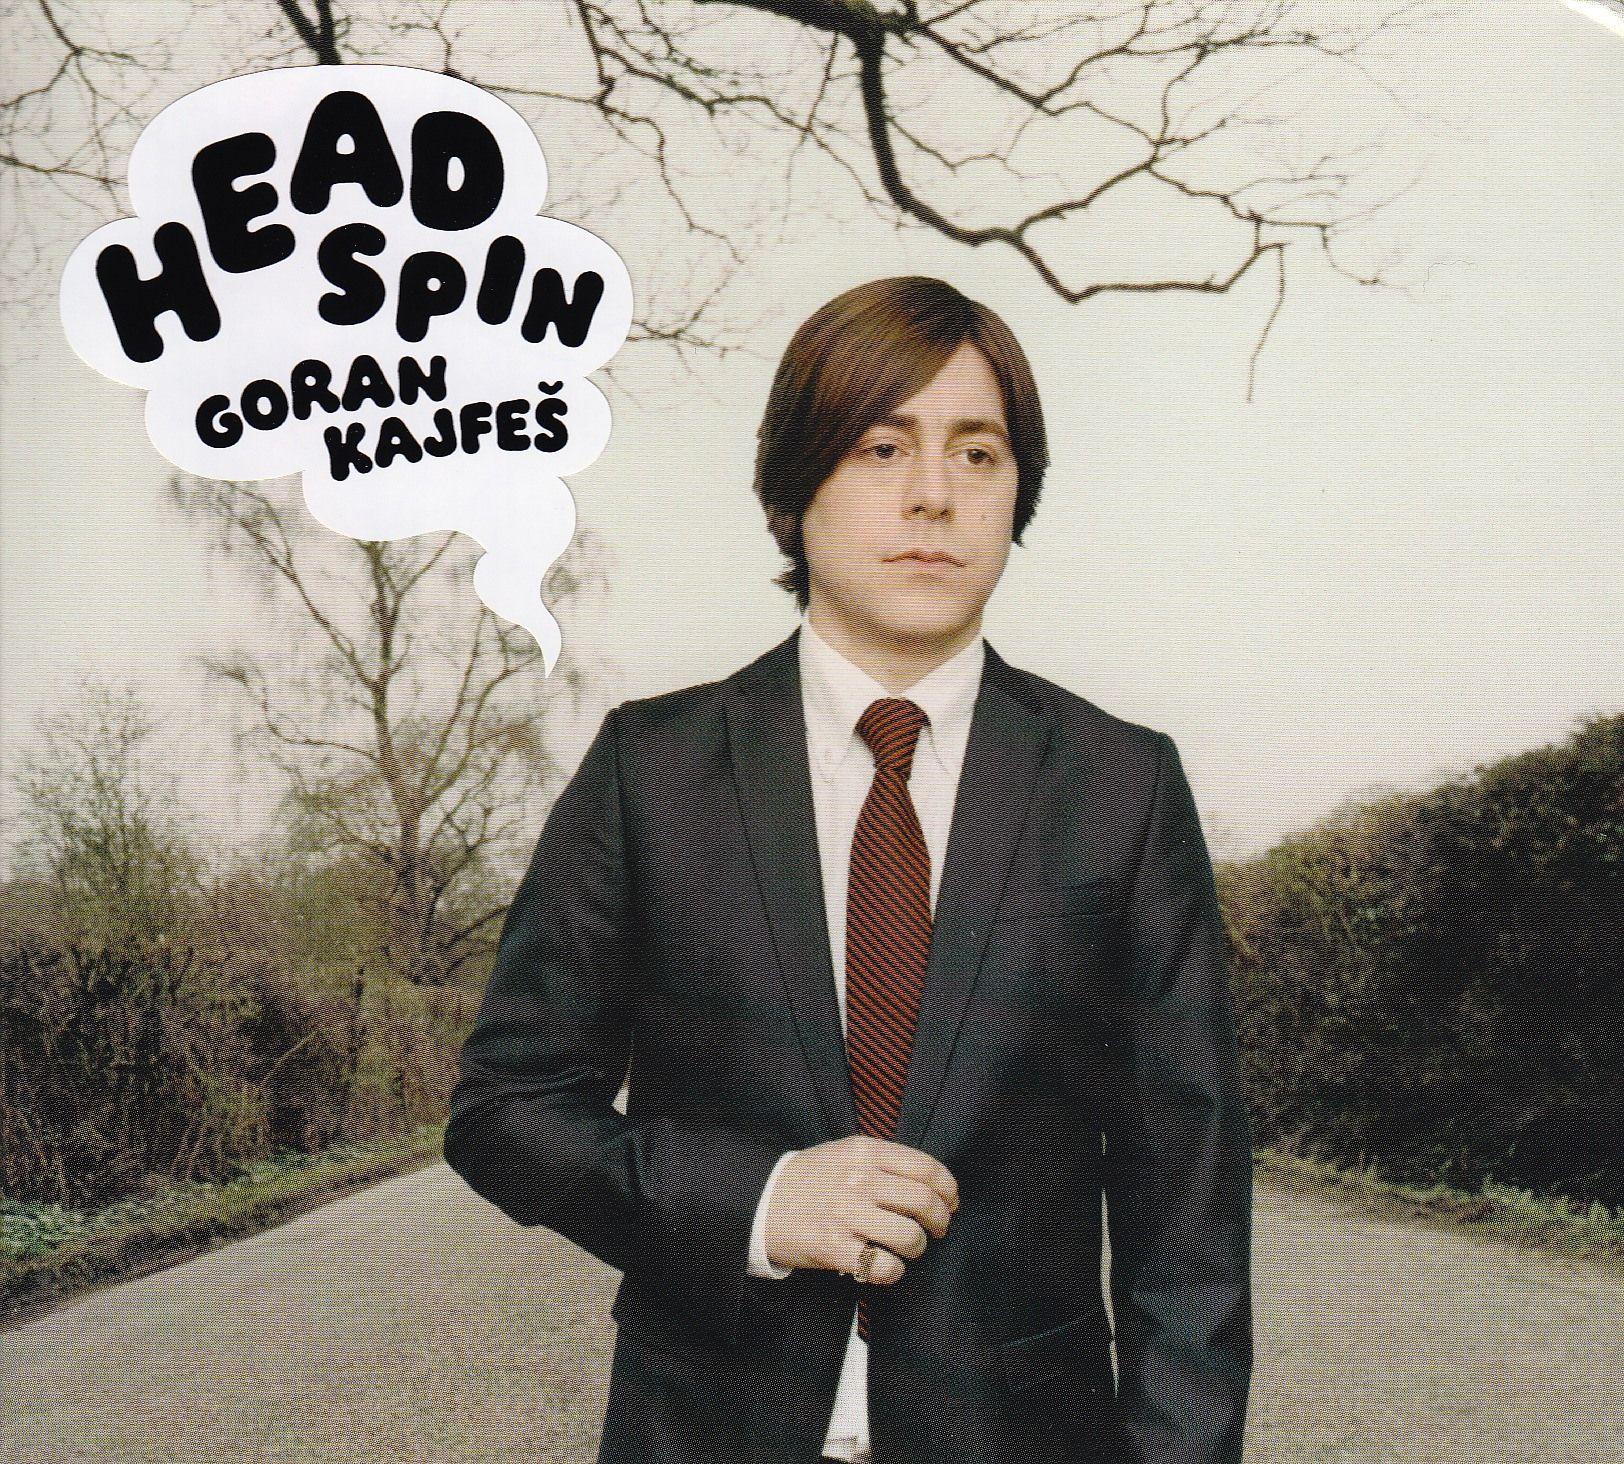 Head Spin by Goran Kajfes - Music Charts